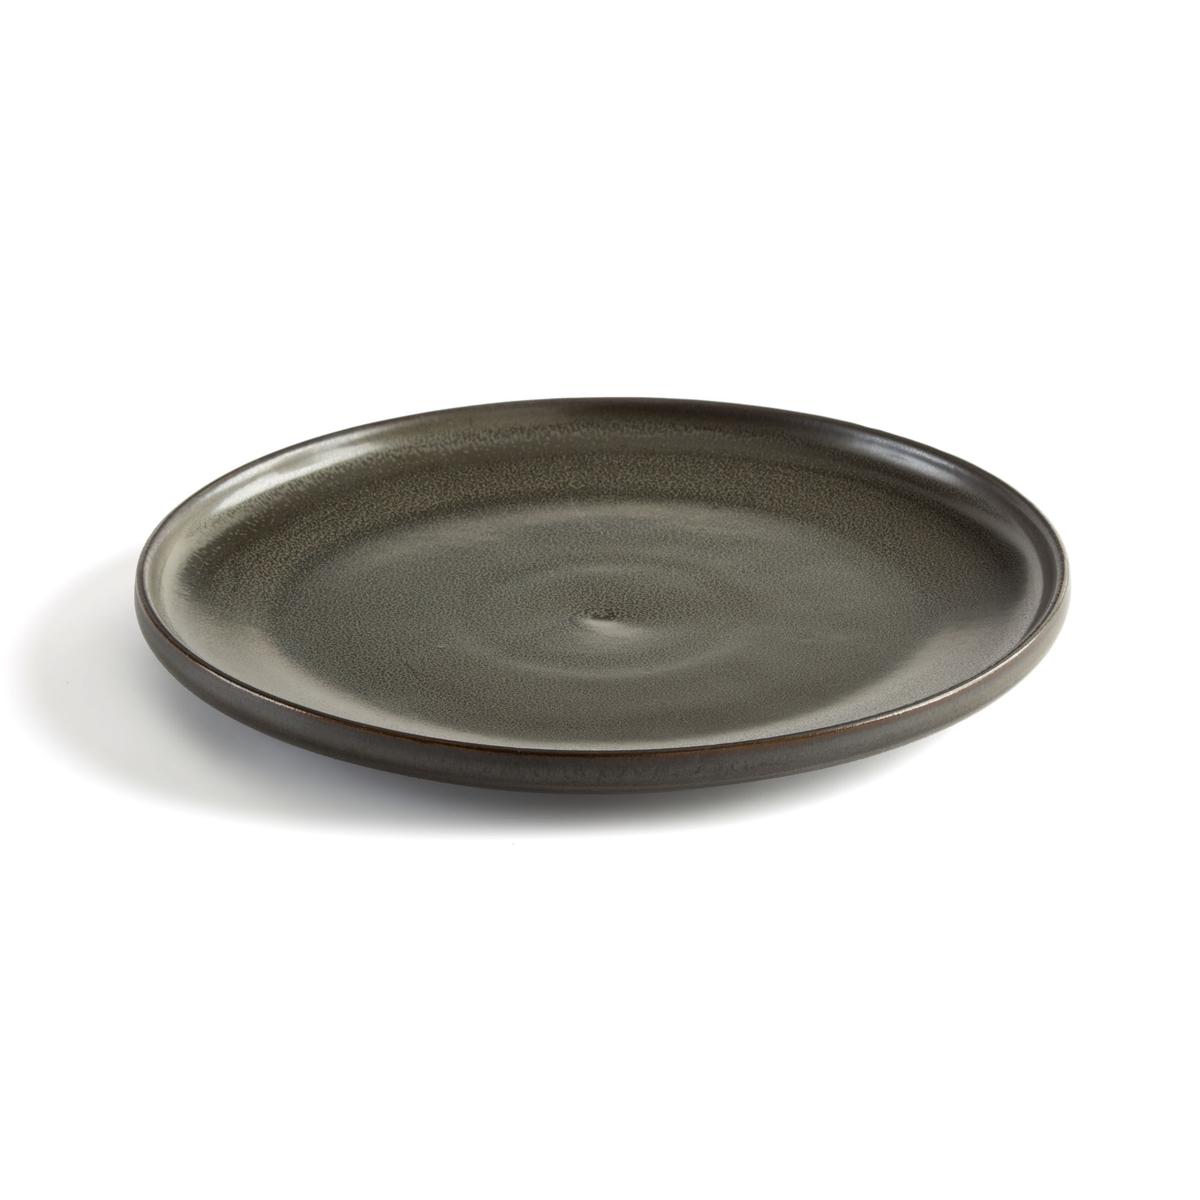 Akira Enamelled Stoneware Flat Plates (Set of 4)